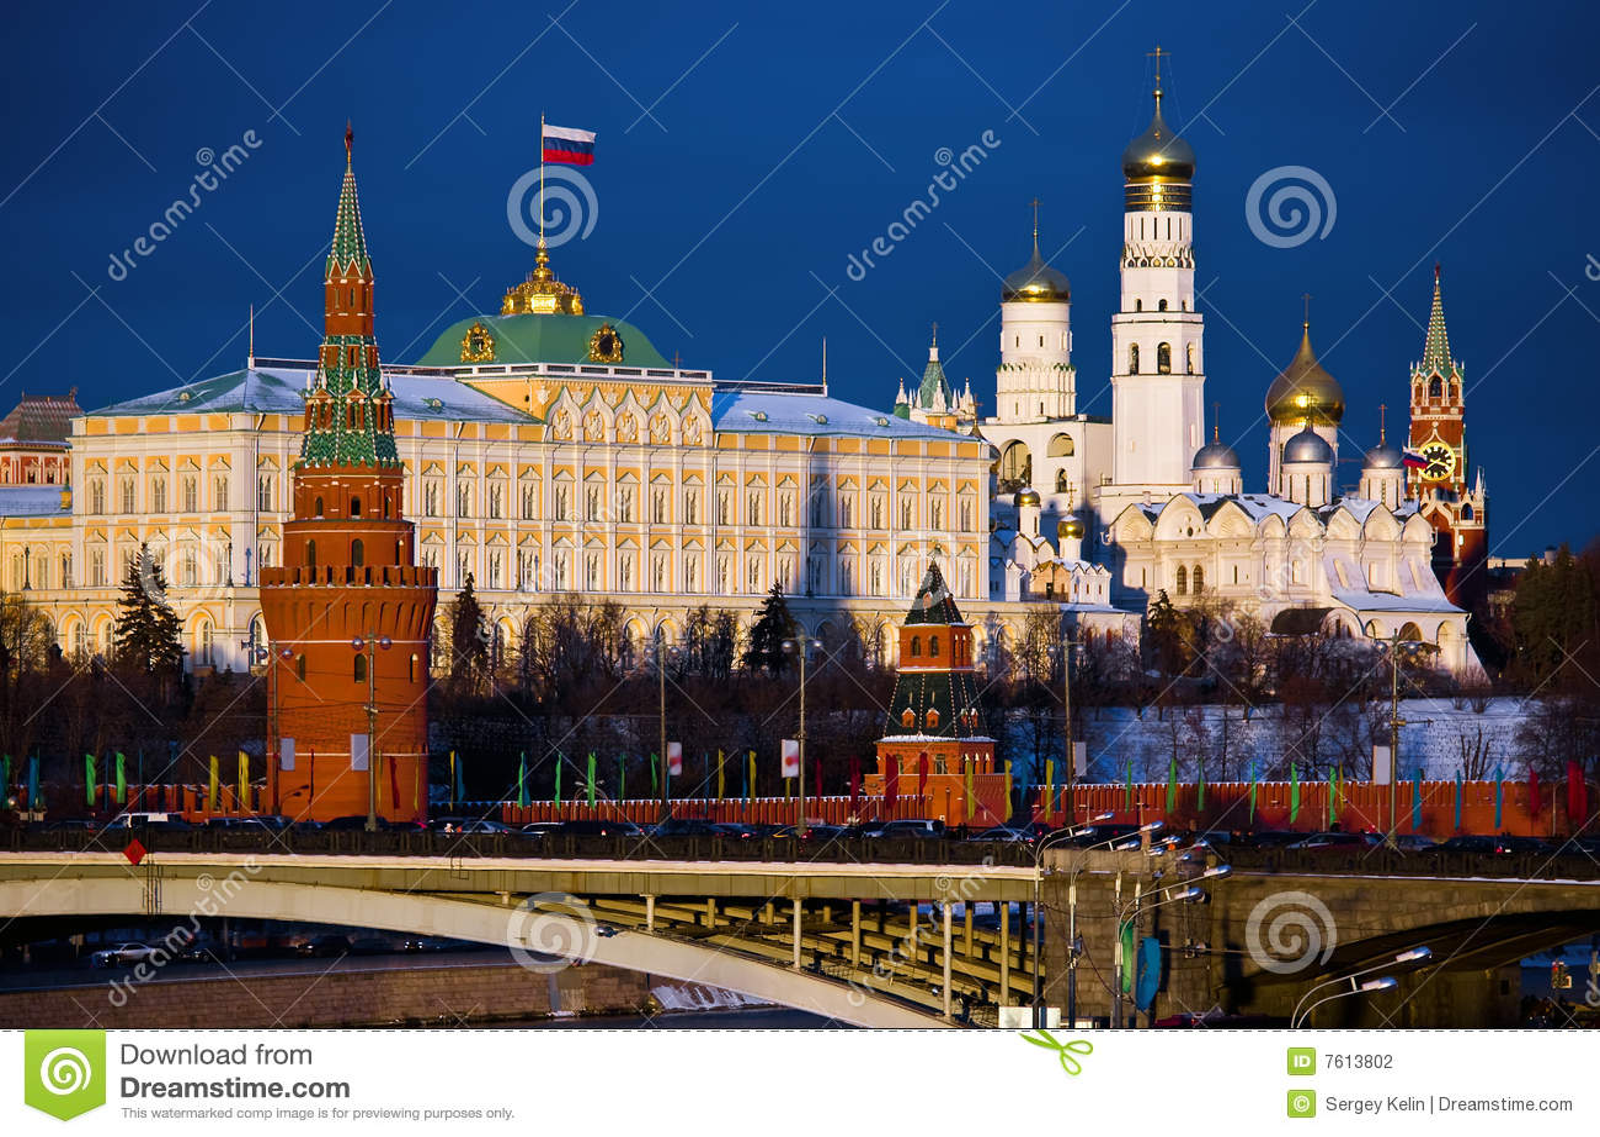 Moscow, Kremlin. Russia